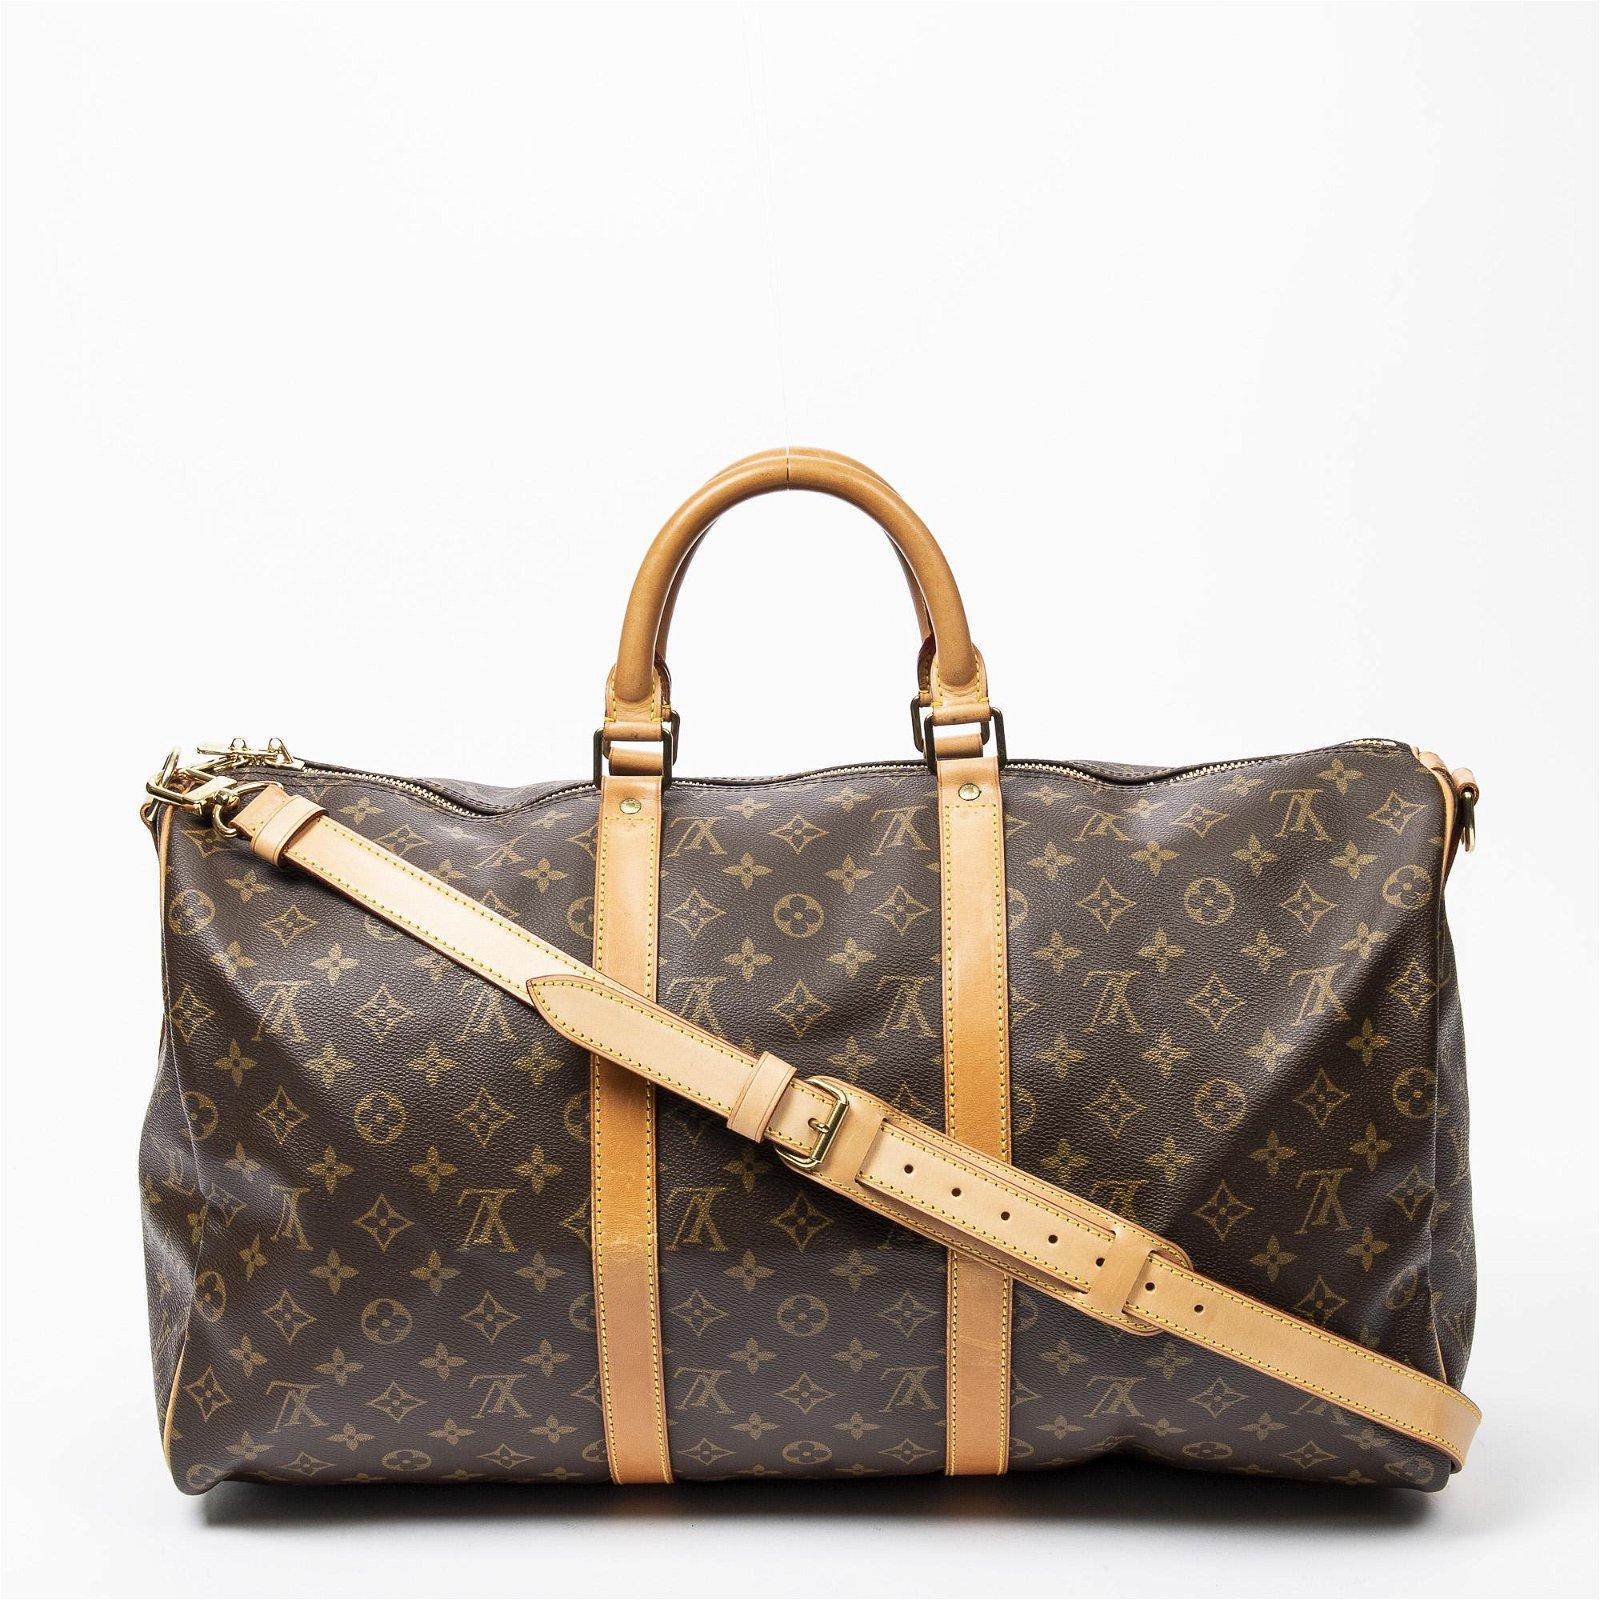 Louis Vuitton Keepall Bandouliere 50